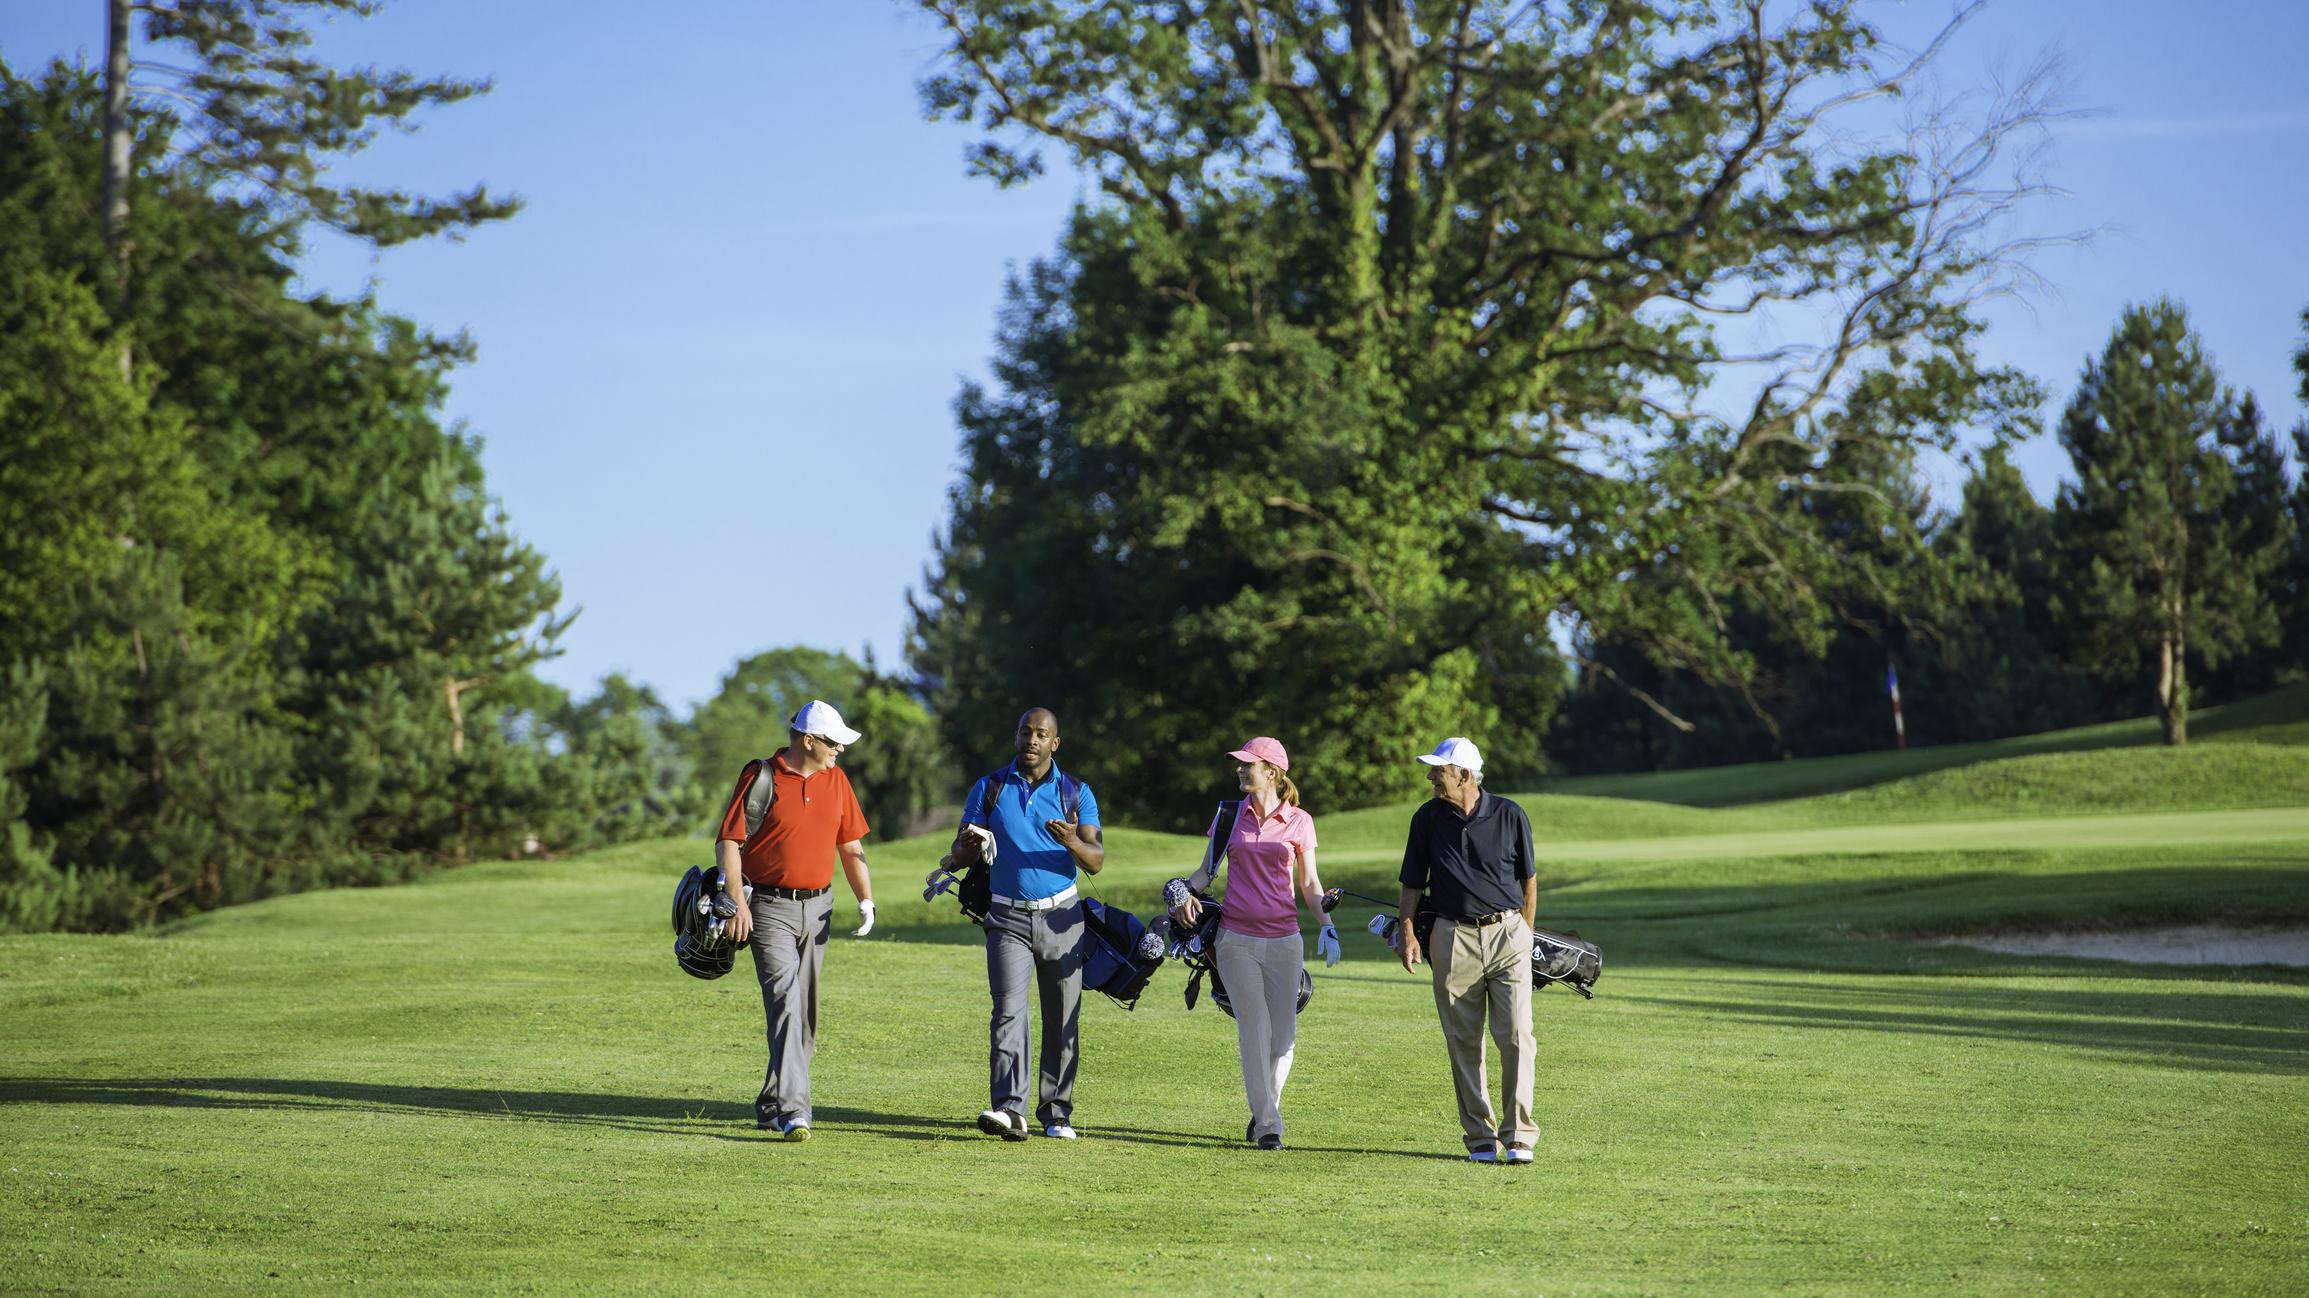 Our Golf Buddies